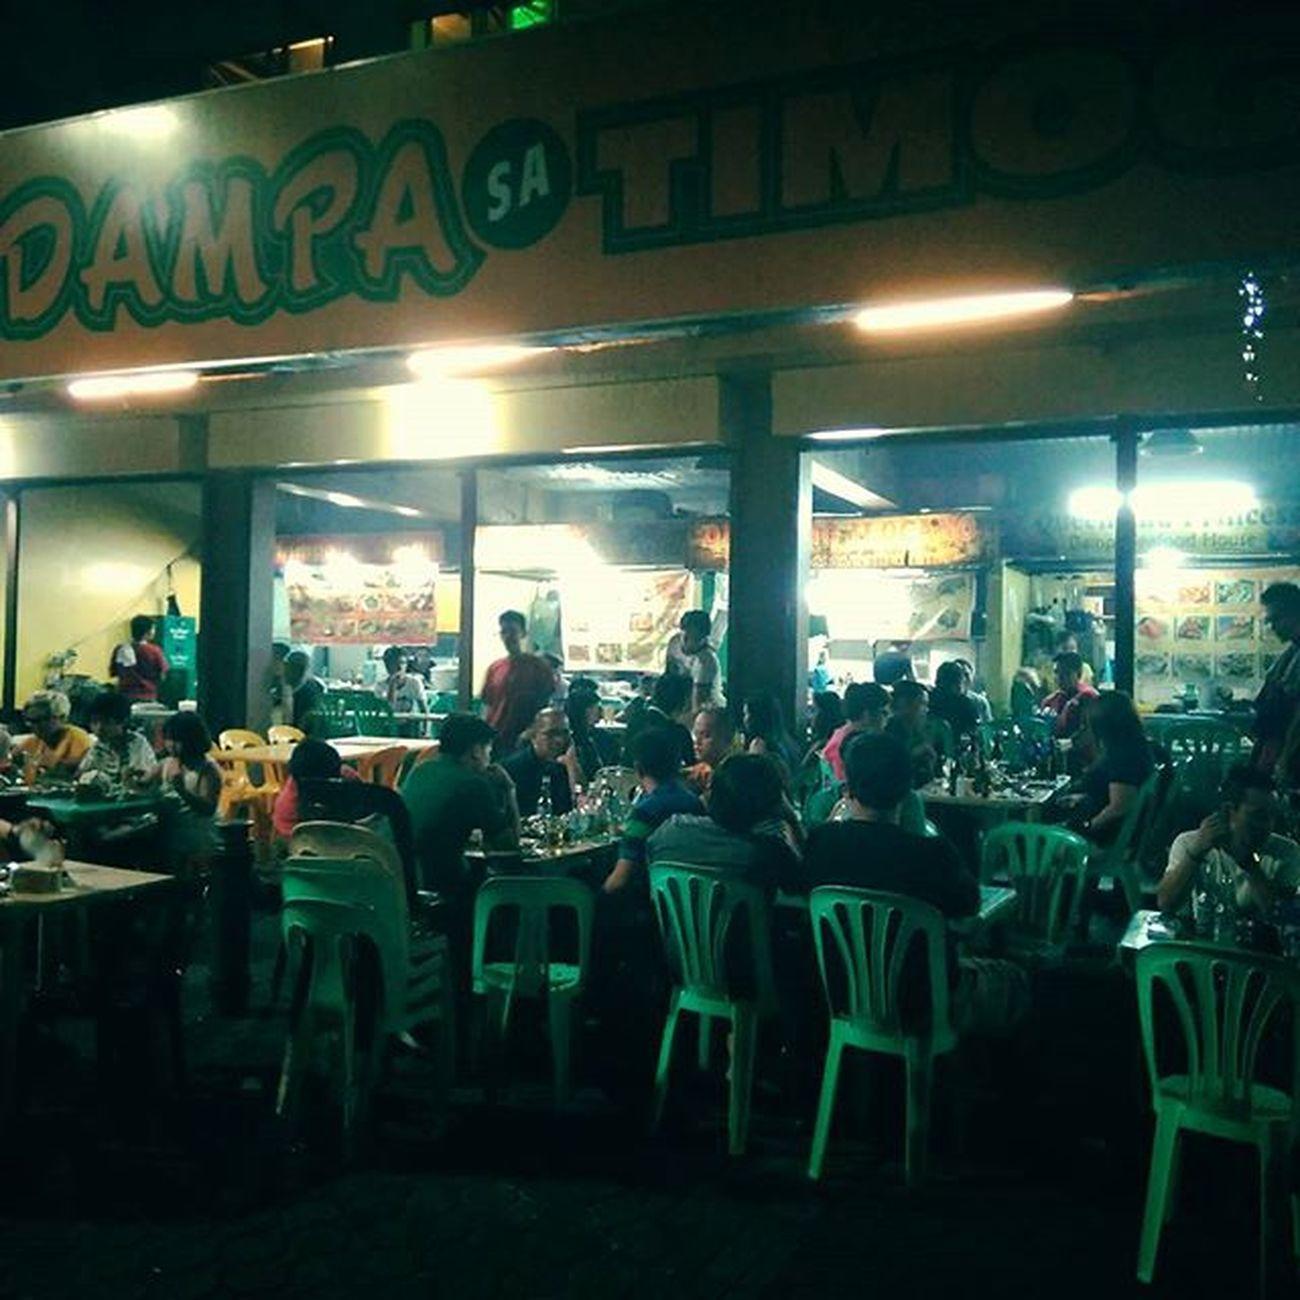 Friday night binge fresh seafood and beer! Tgif Dampa Seafood Timog quezoncity metromanila philippines nightscene streetphotography urbanphotography urban backpacking backpacker food foodie travel travelgram travelgasm instatravel instagood streetfood travelphotography